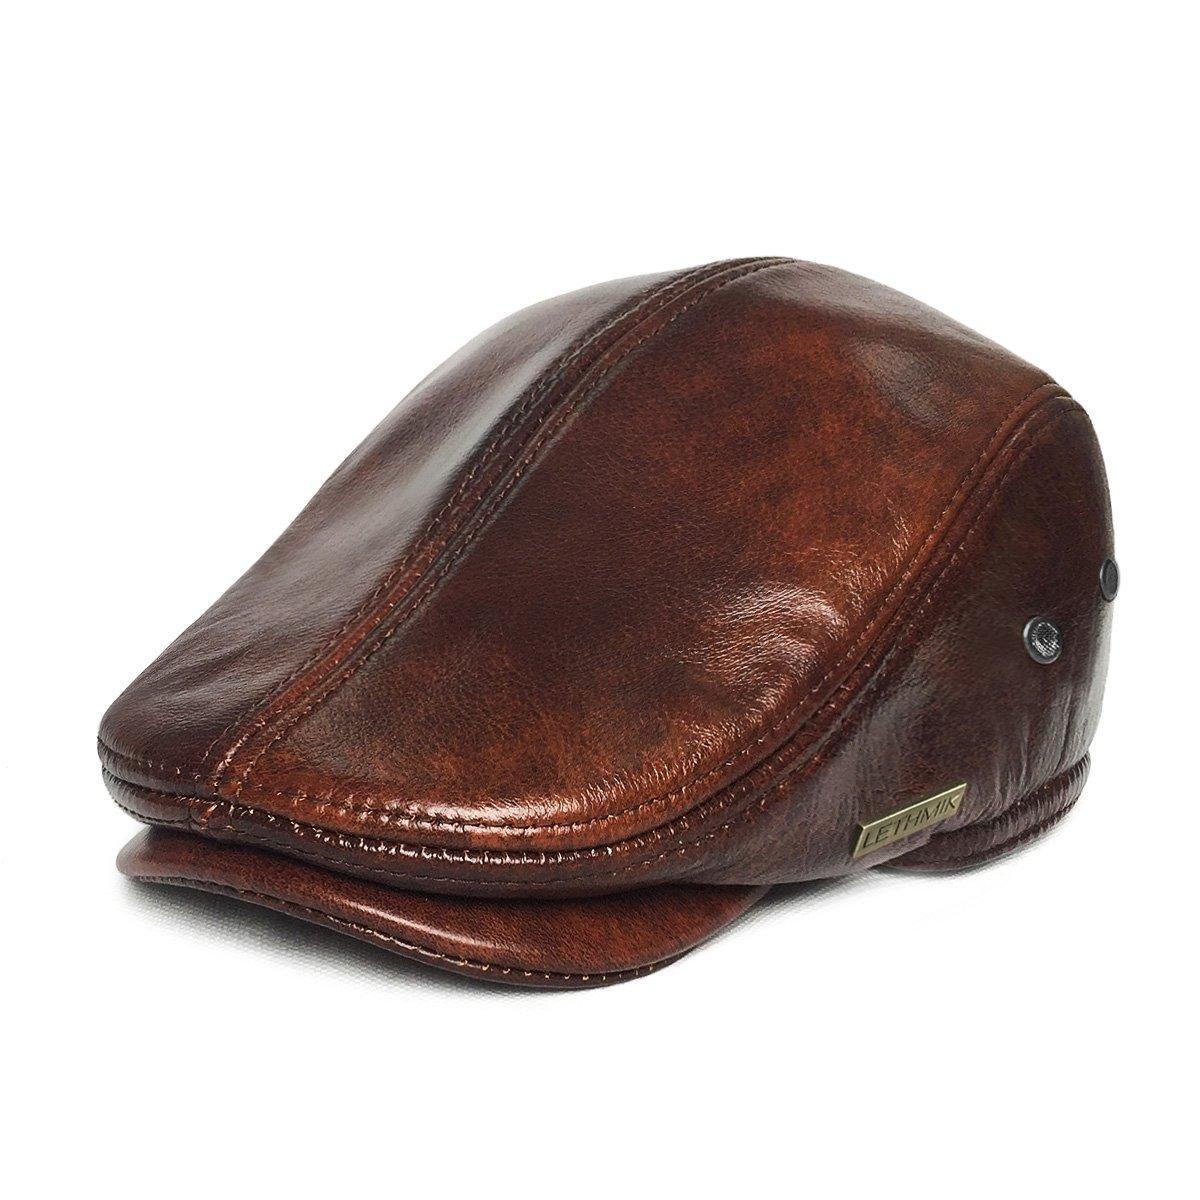 359b6a51888e62 Amazon.com: LETHMIK Flat Cap Cabby Hat Genuine Leather Vintage Newsboy Cap  Ivy Driving Cap: Clothing